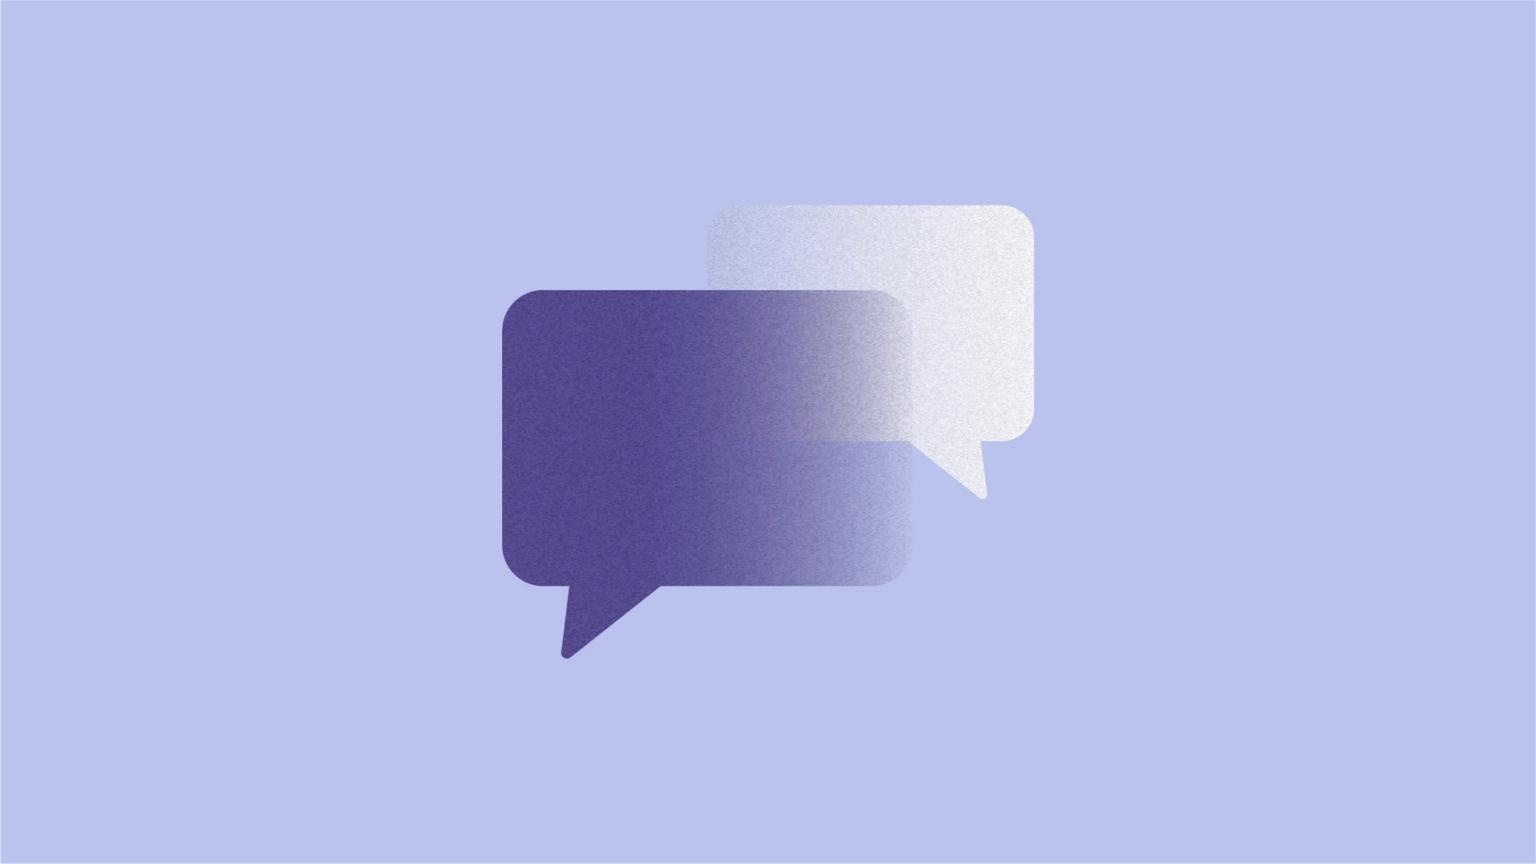 Facebook表示Messenger应用的端到端加密功能目前不是开发侧重点